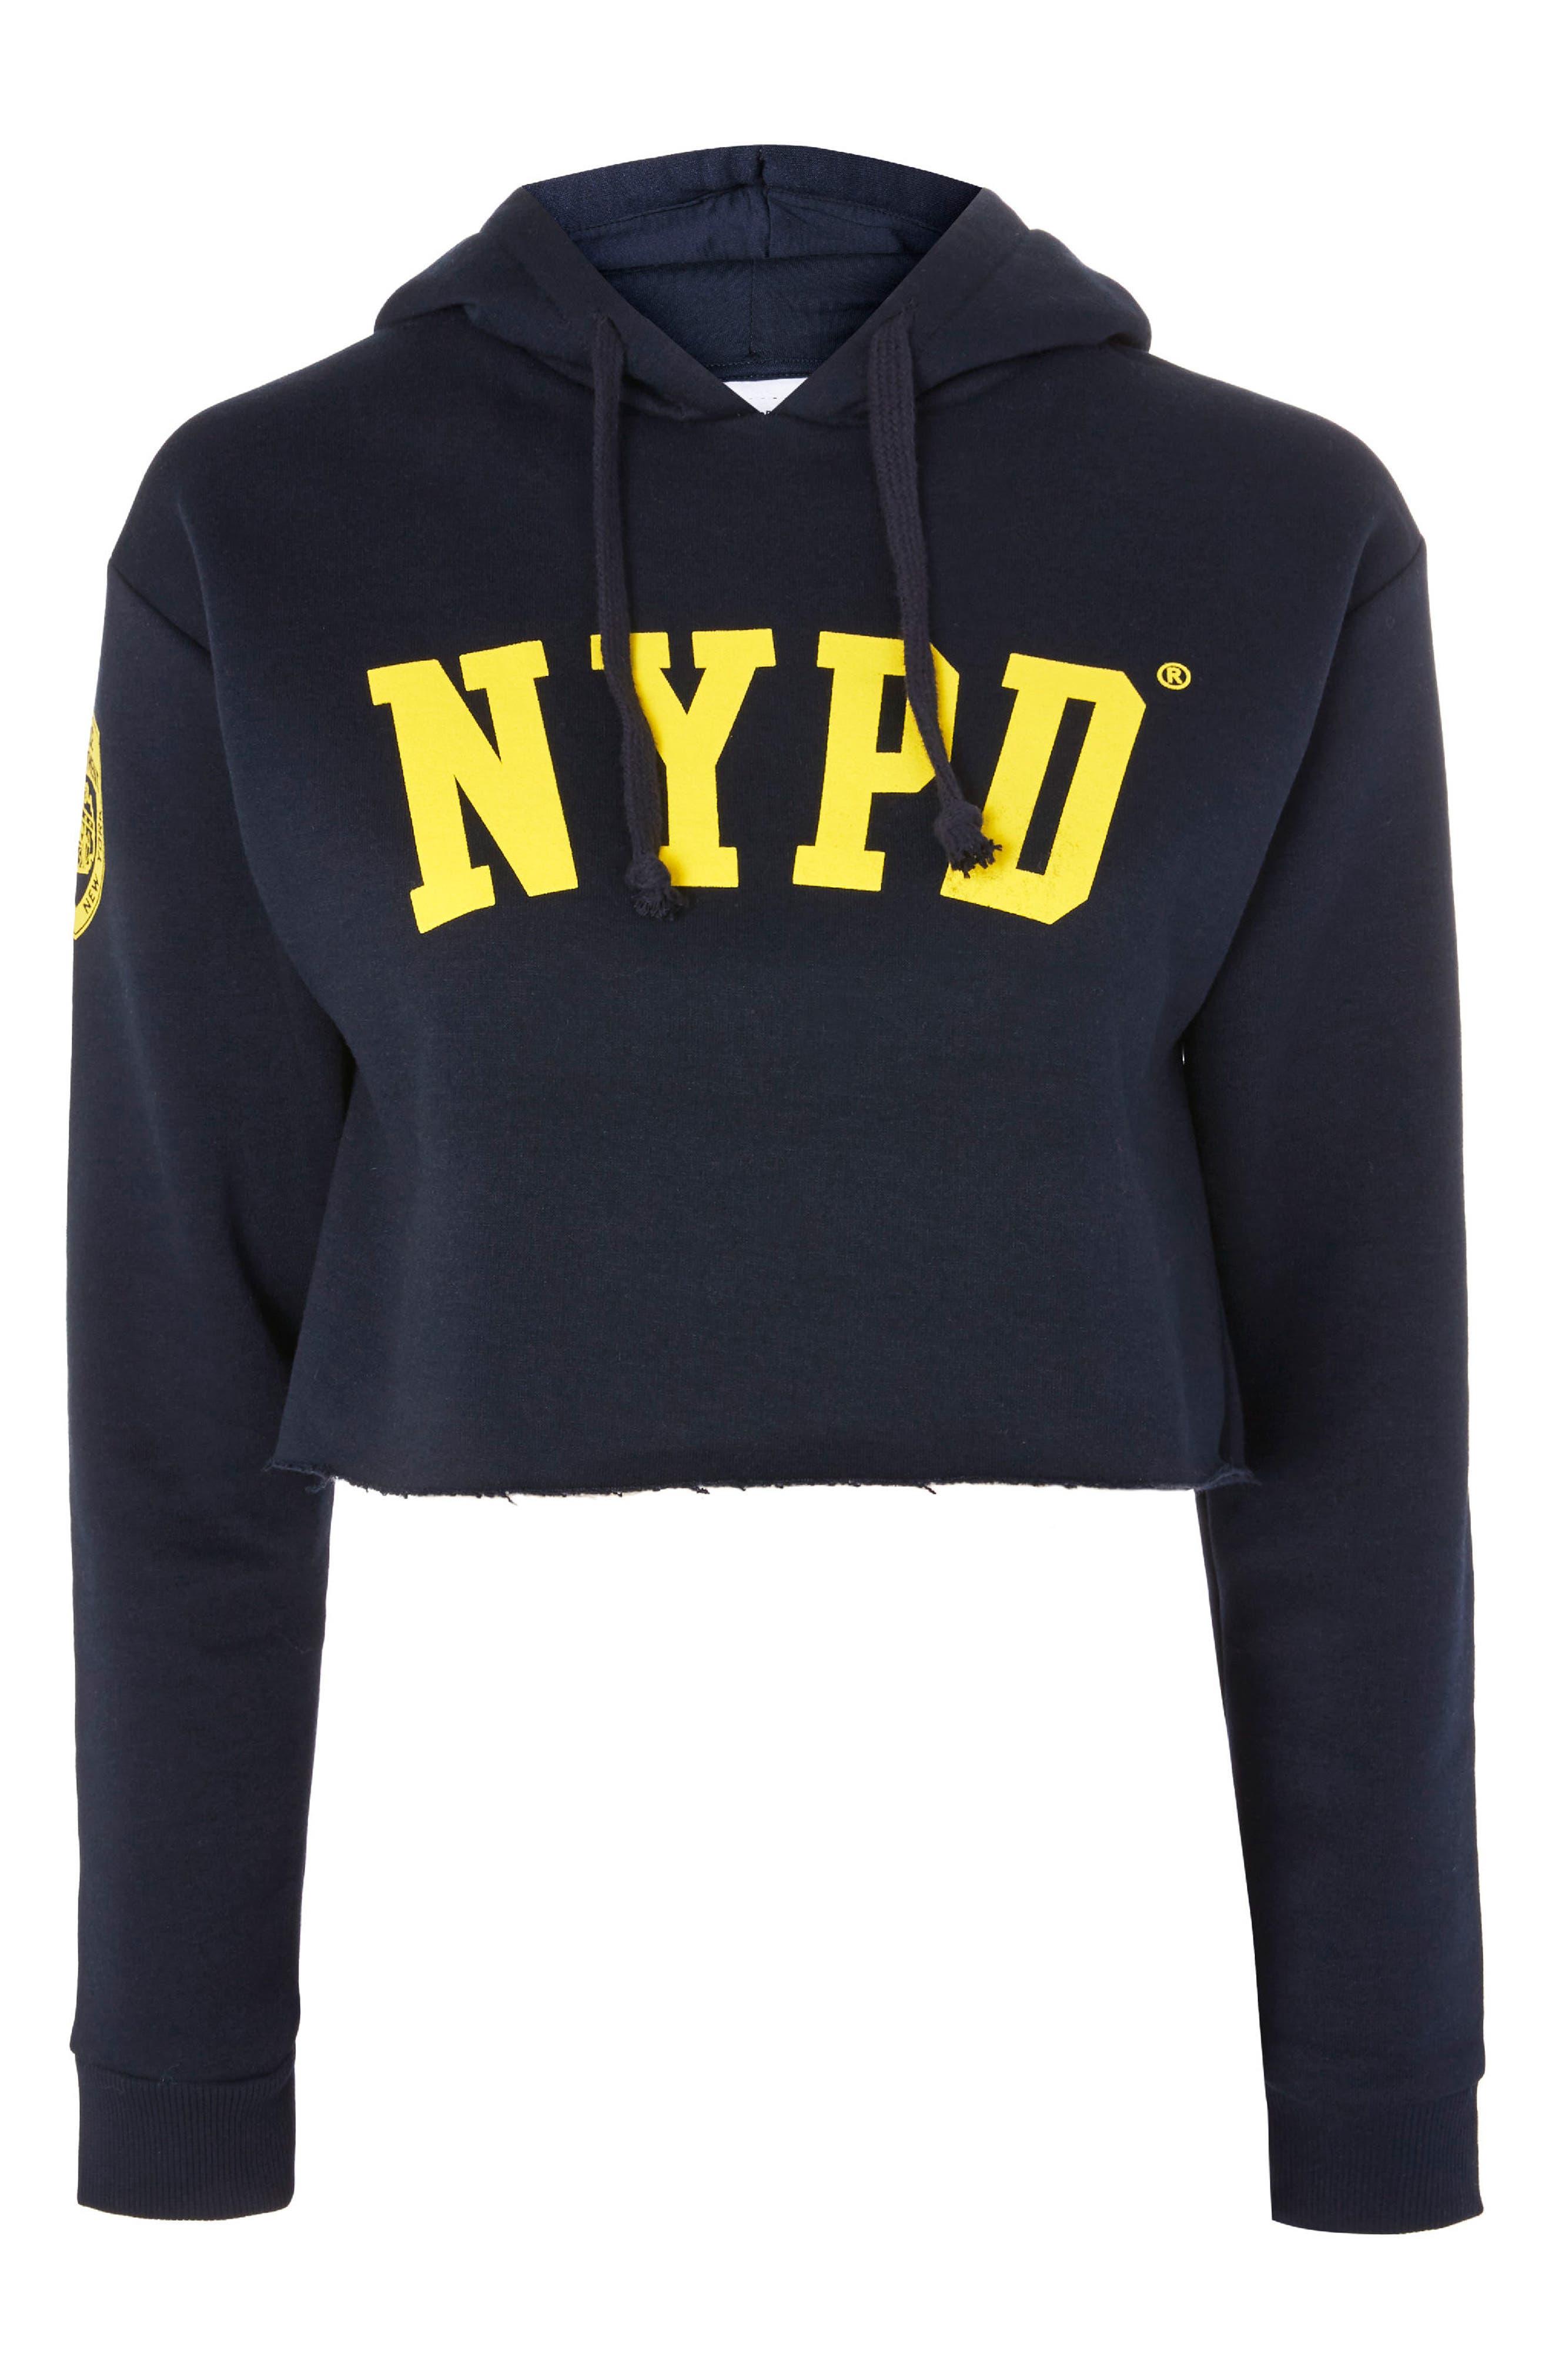 by Tee & Cake NYPD Crop Hoodie,                             Alternate thumbnail 4, color,                             Navy Blue Multi